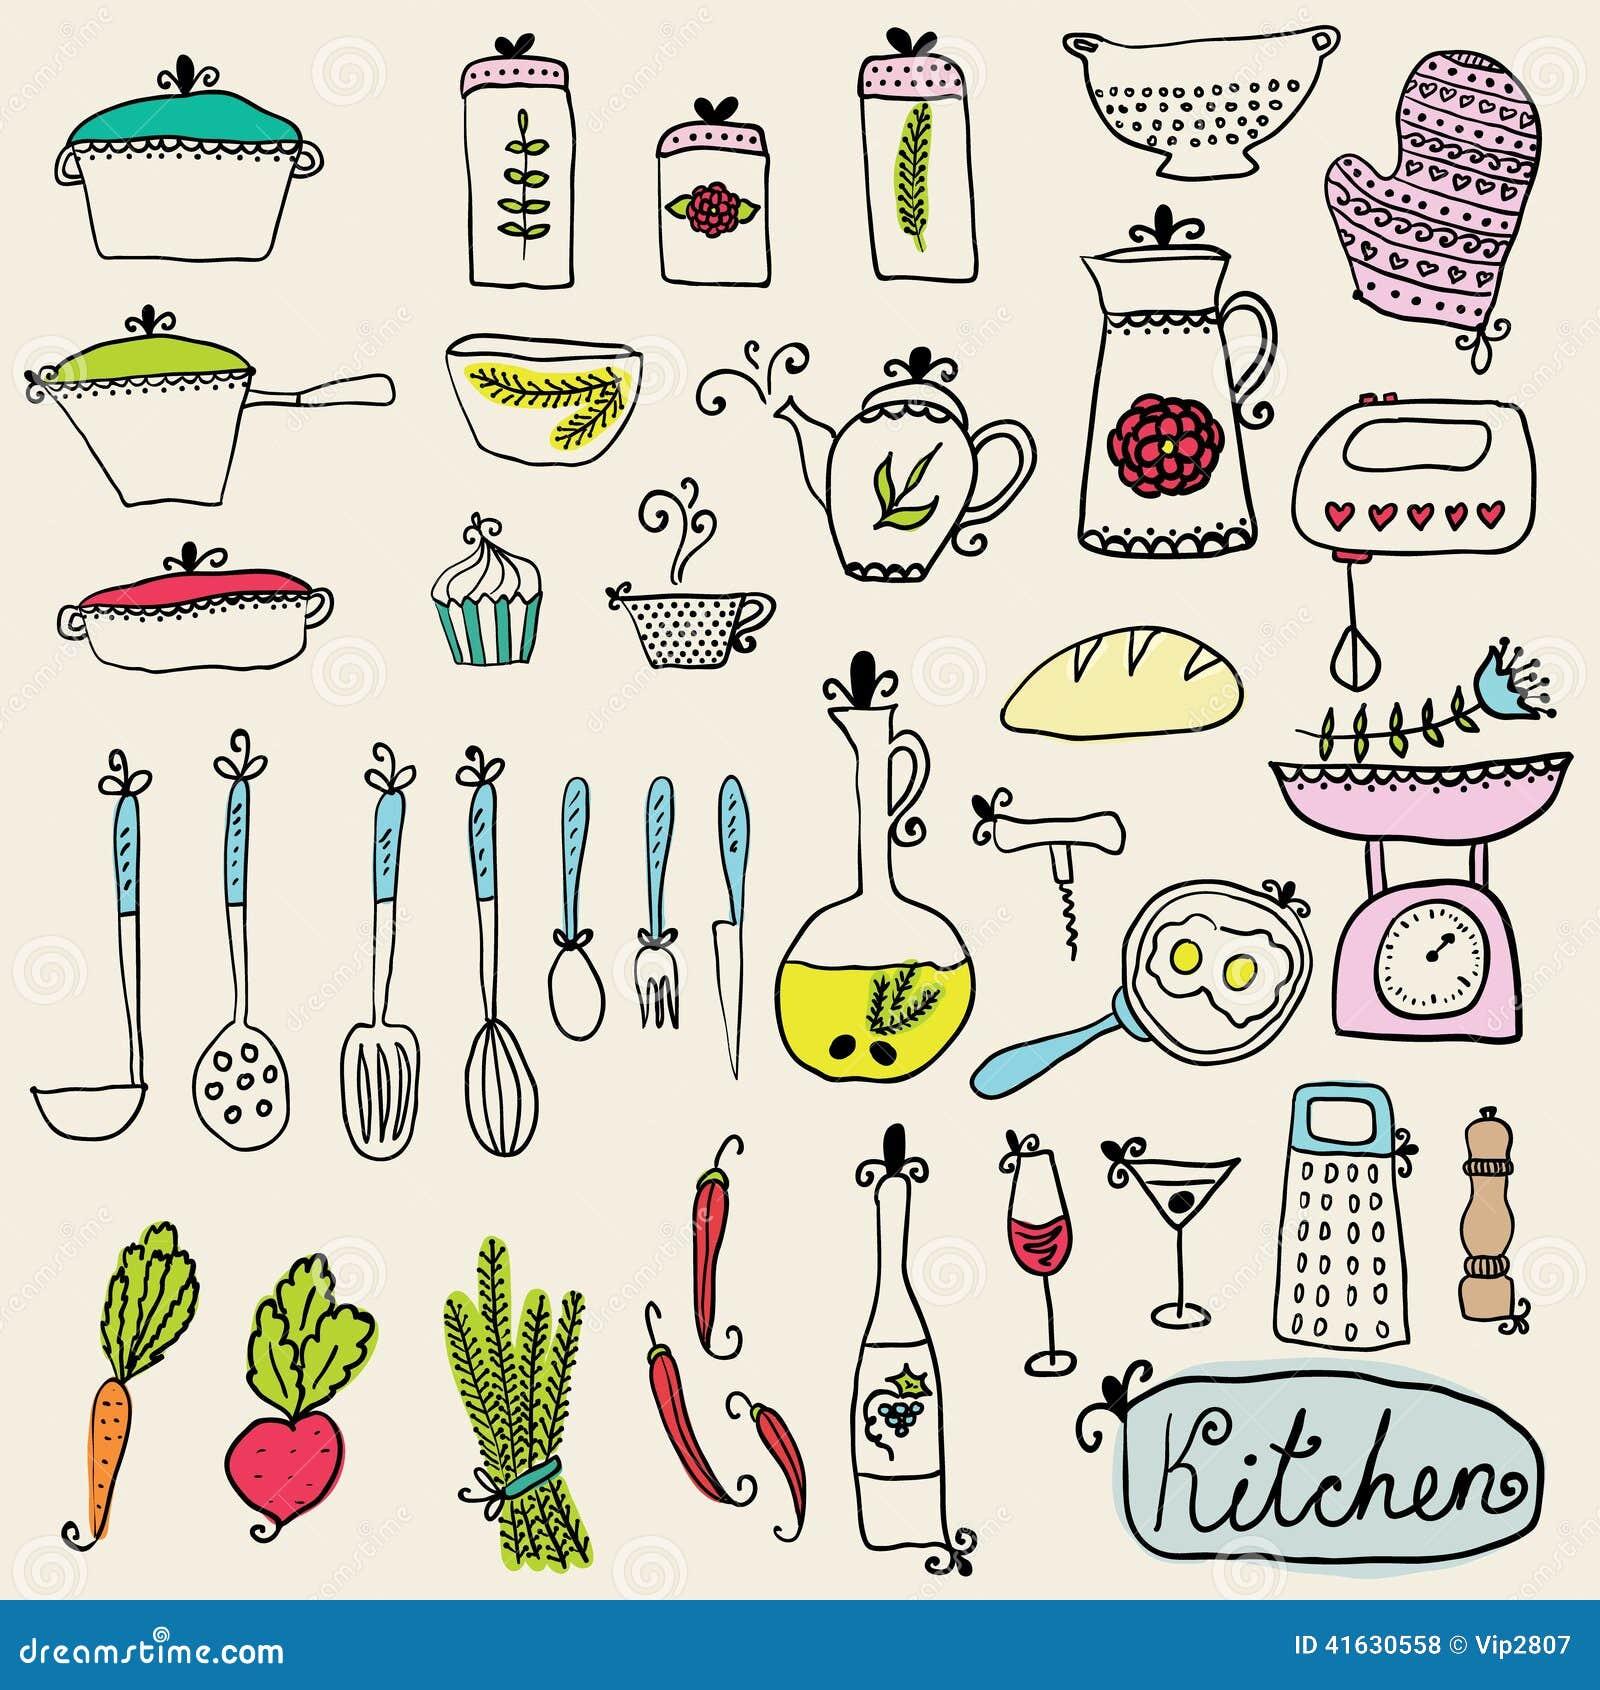 Kitchen Set In Vector Stylish Design Elements Of Kitchen Stock Vector Illustration 41630558